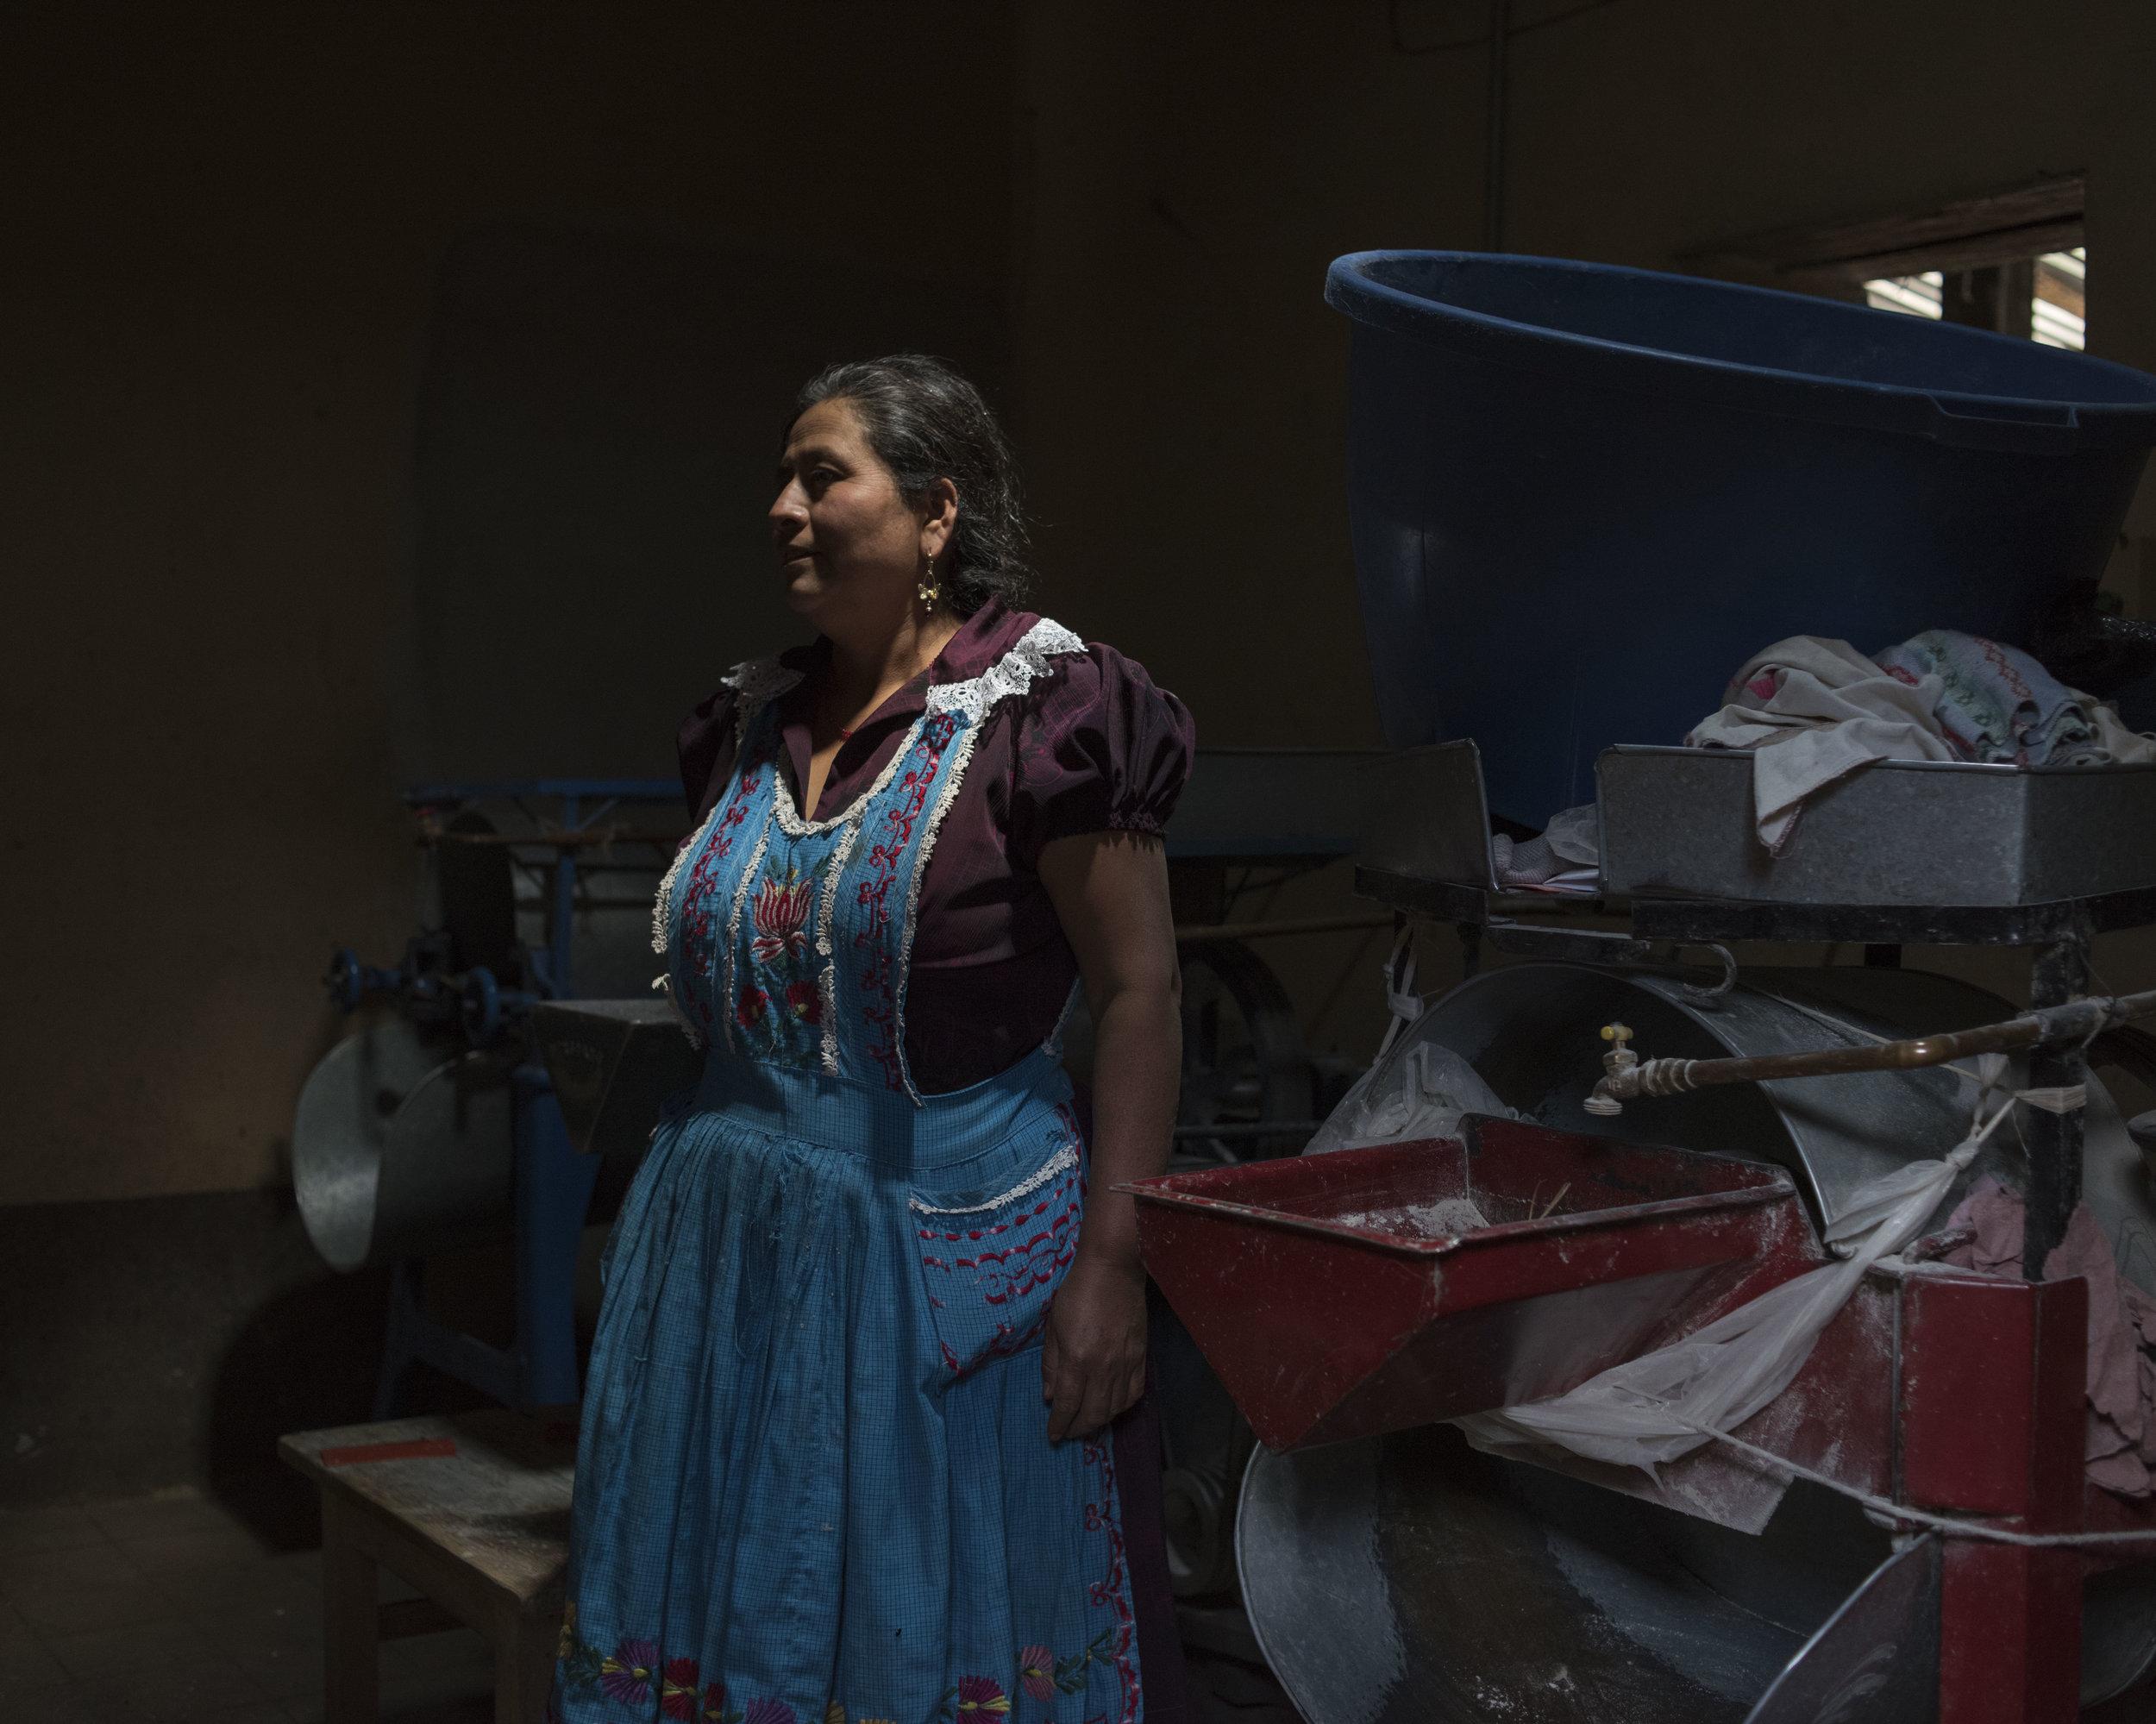 Lucia Hernandez Lopez, San Miguel, OAX.